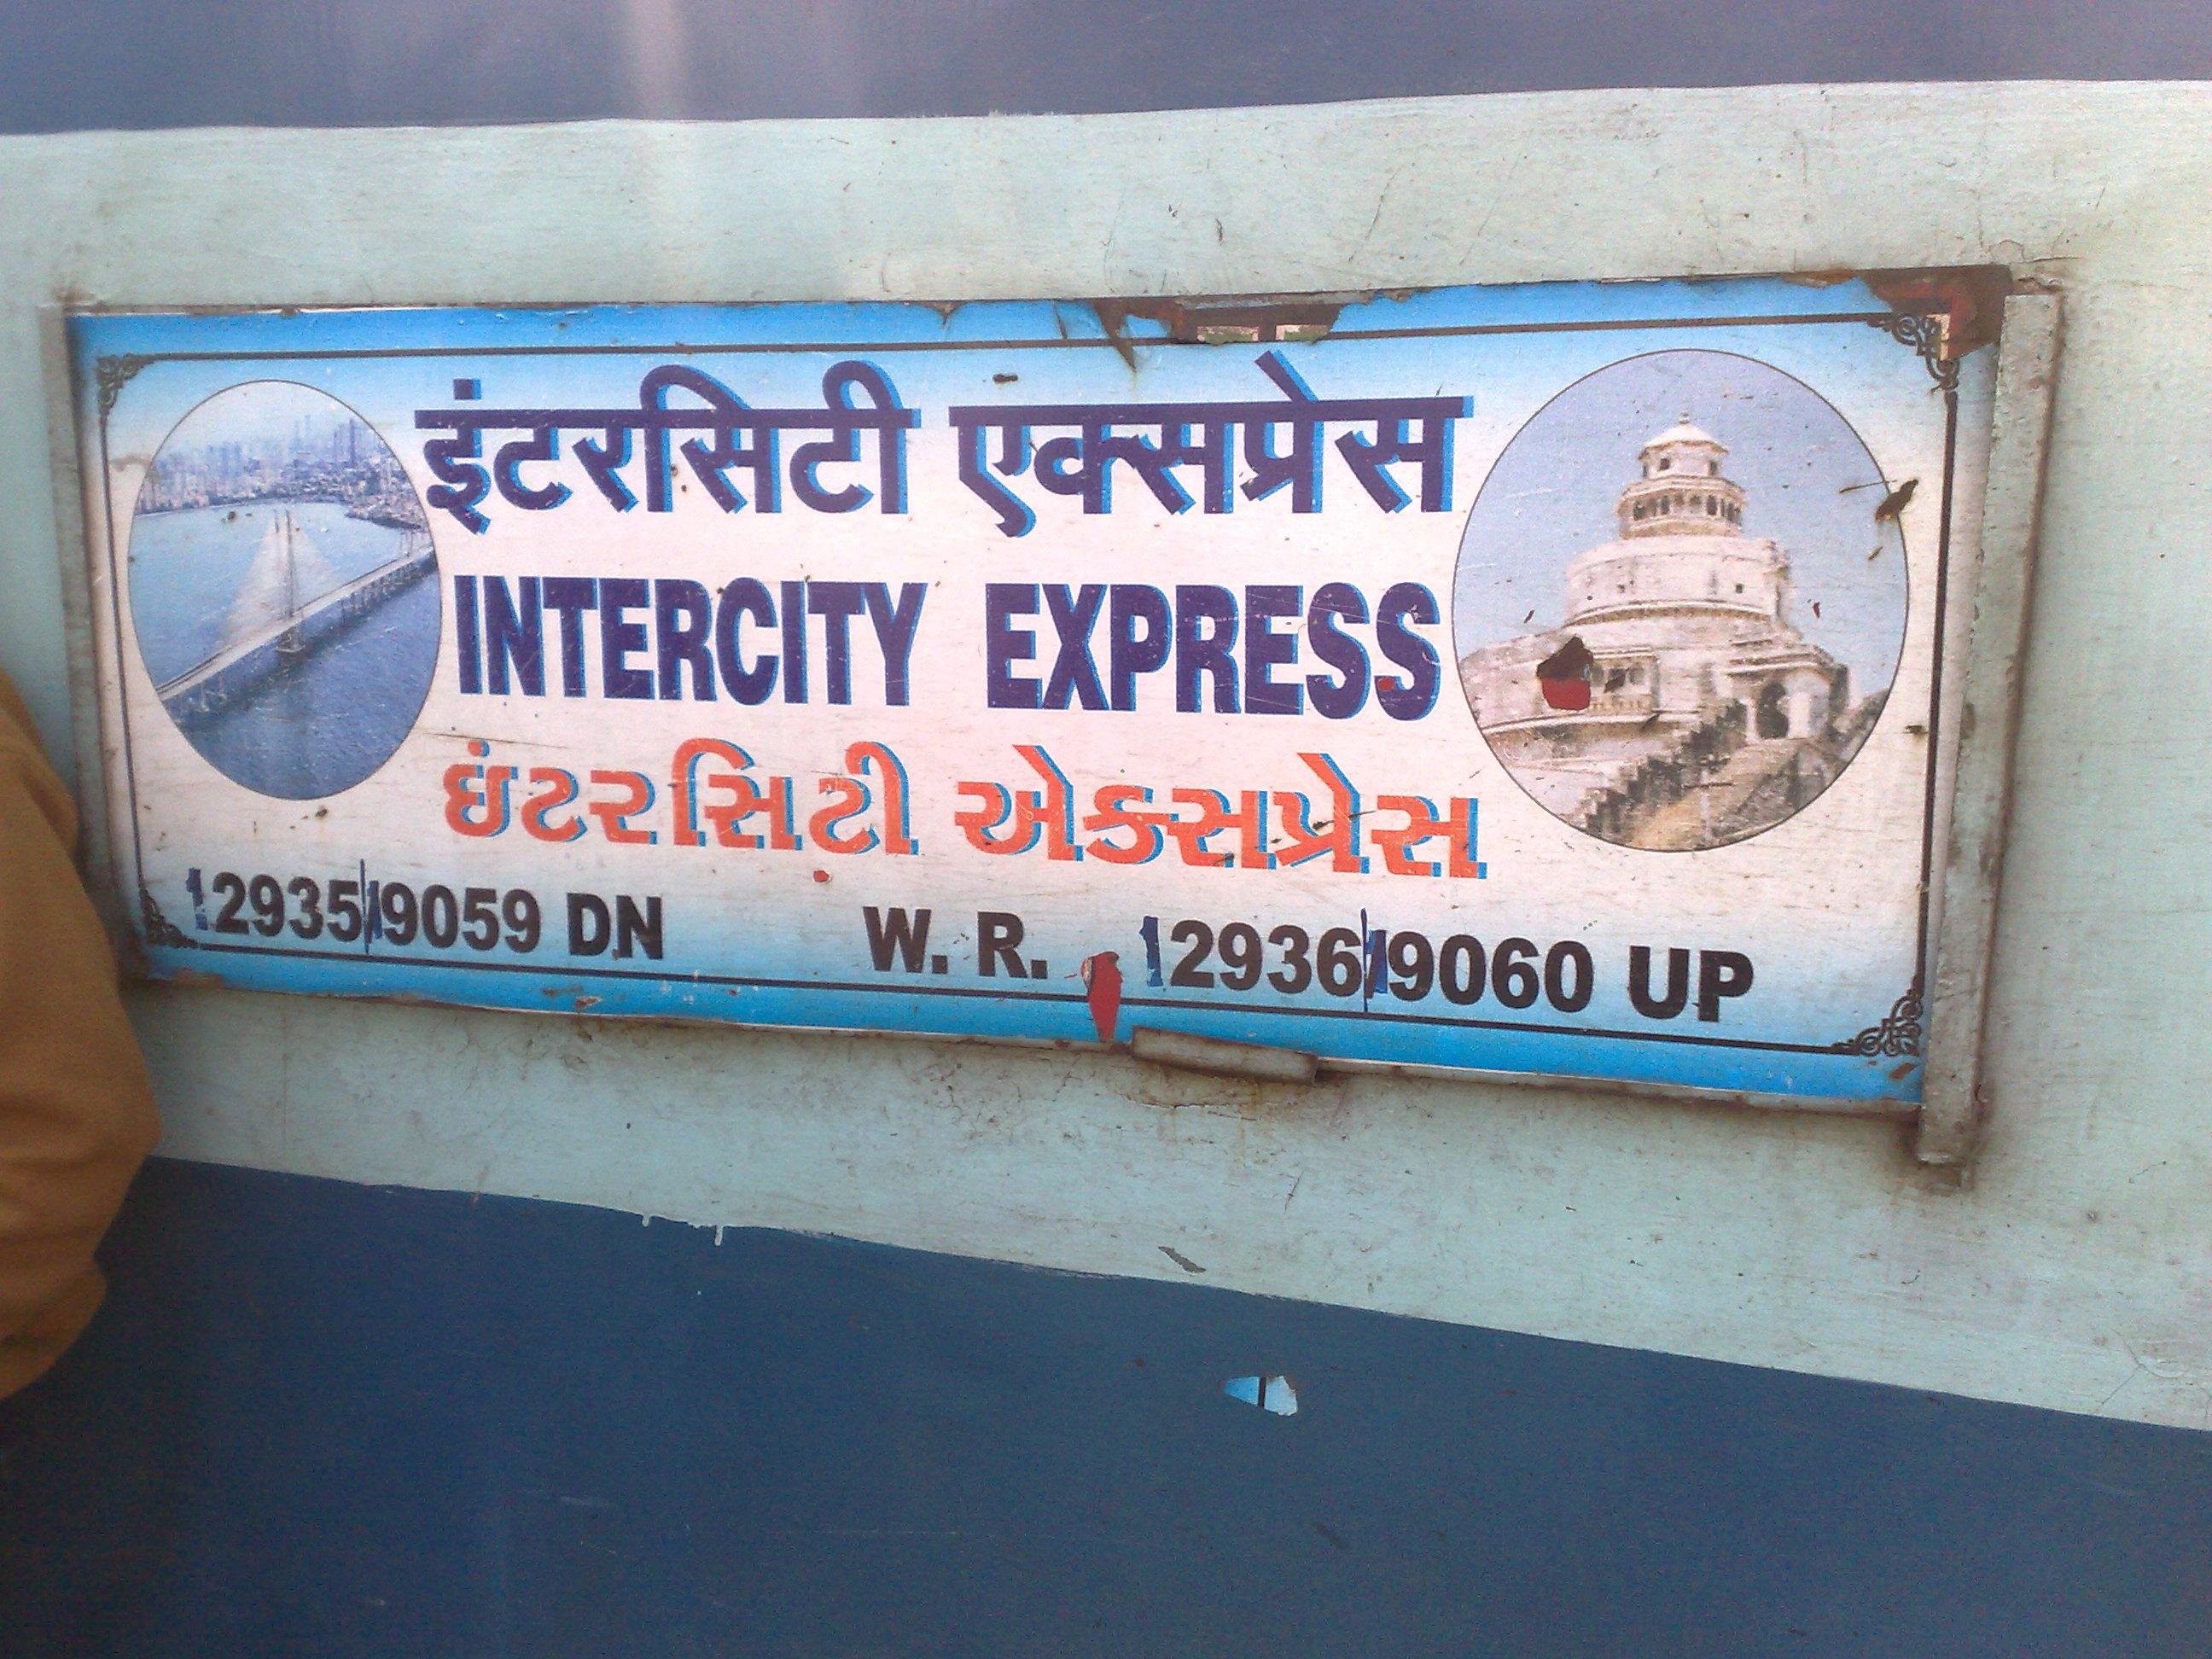 Surat Jamnagar Intercity Express Wikipedia